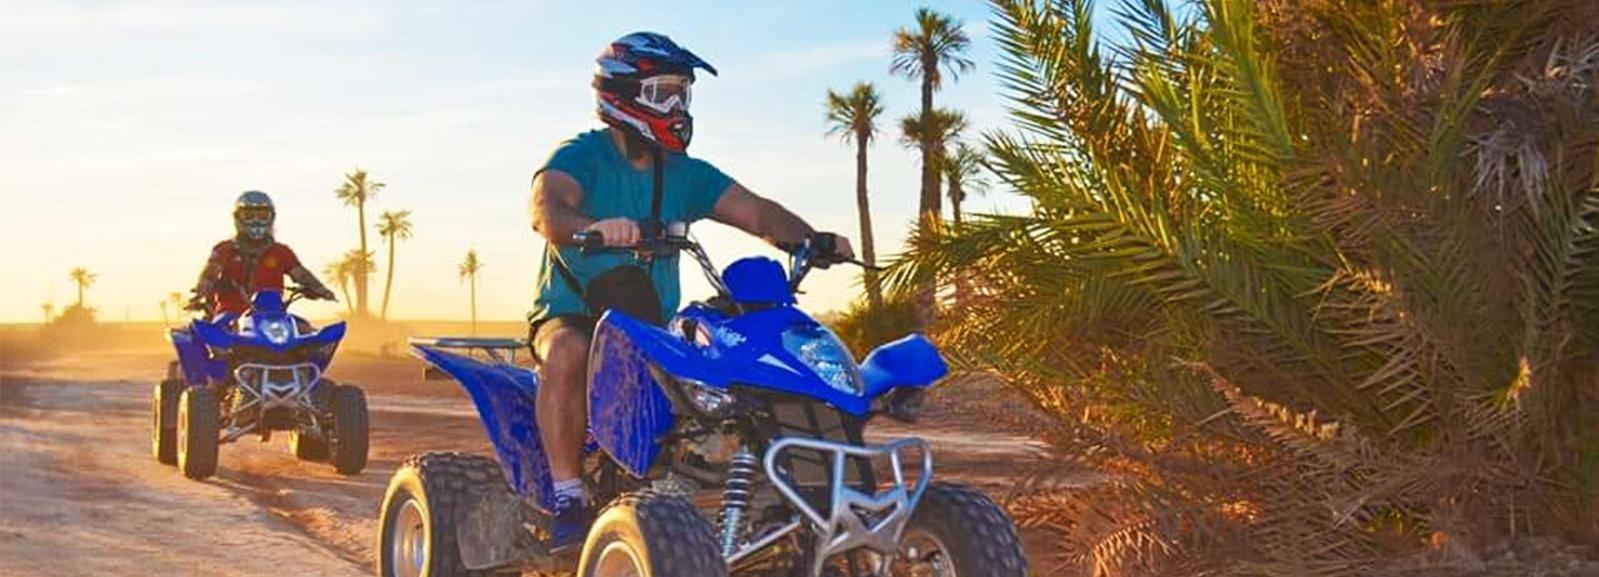 Marrakech Desert & Palm Grove Quad Bike Tour